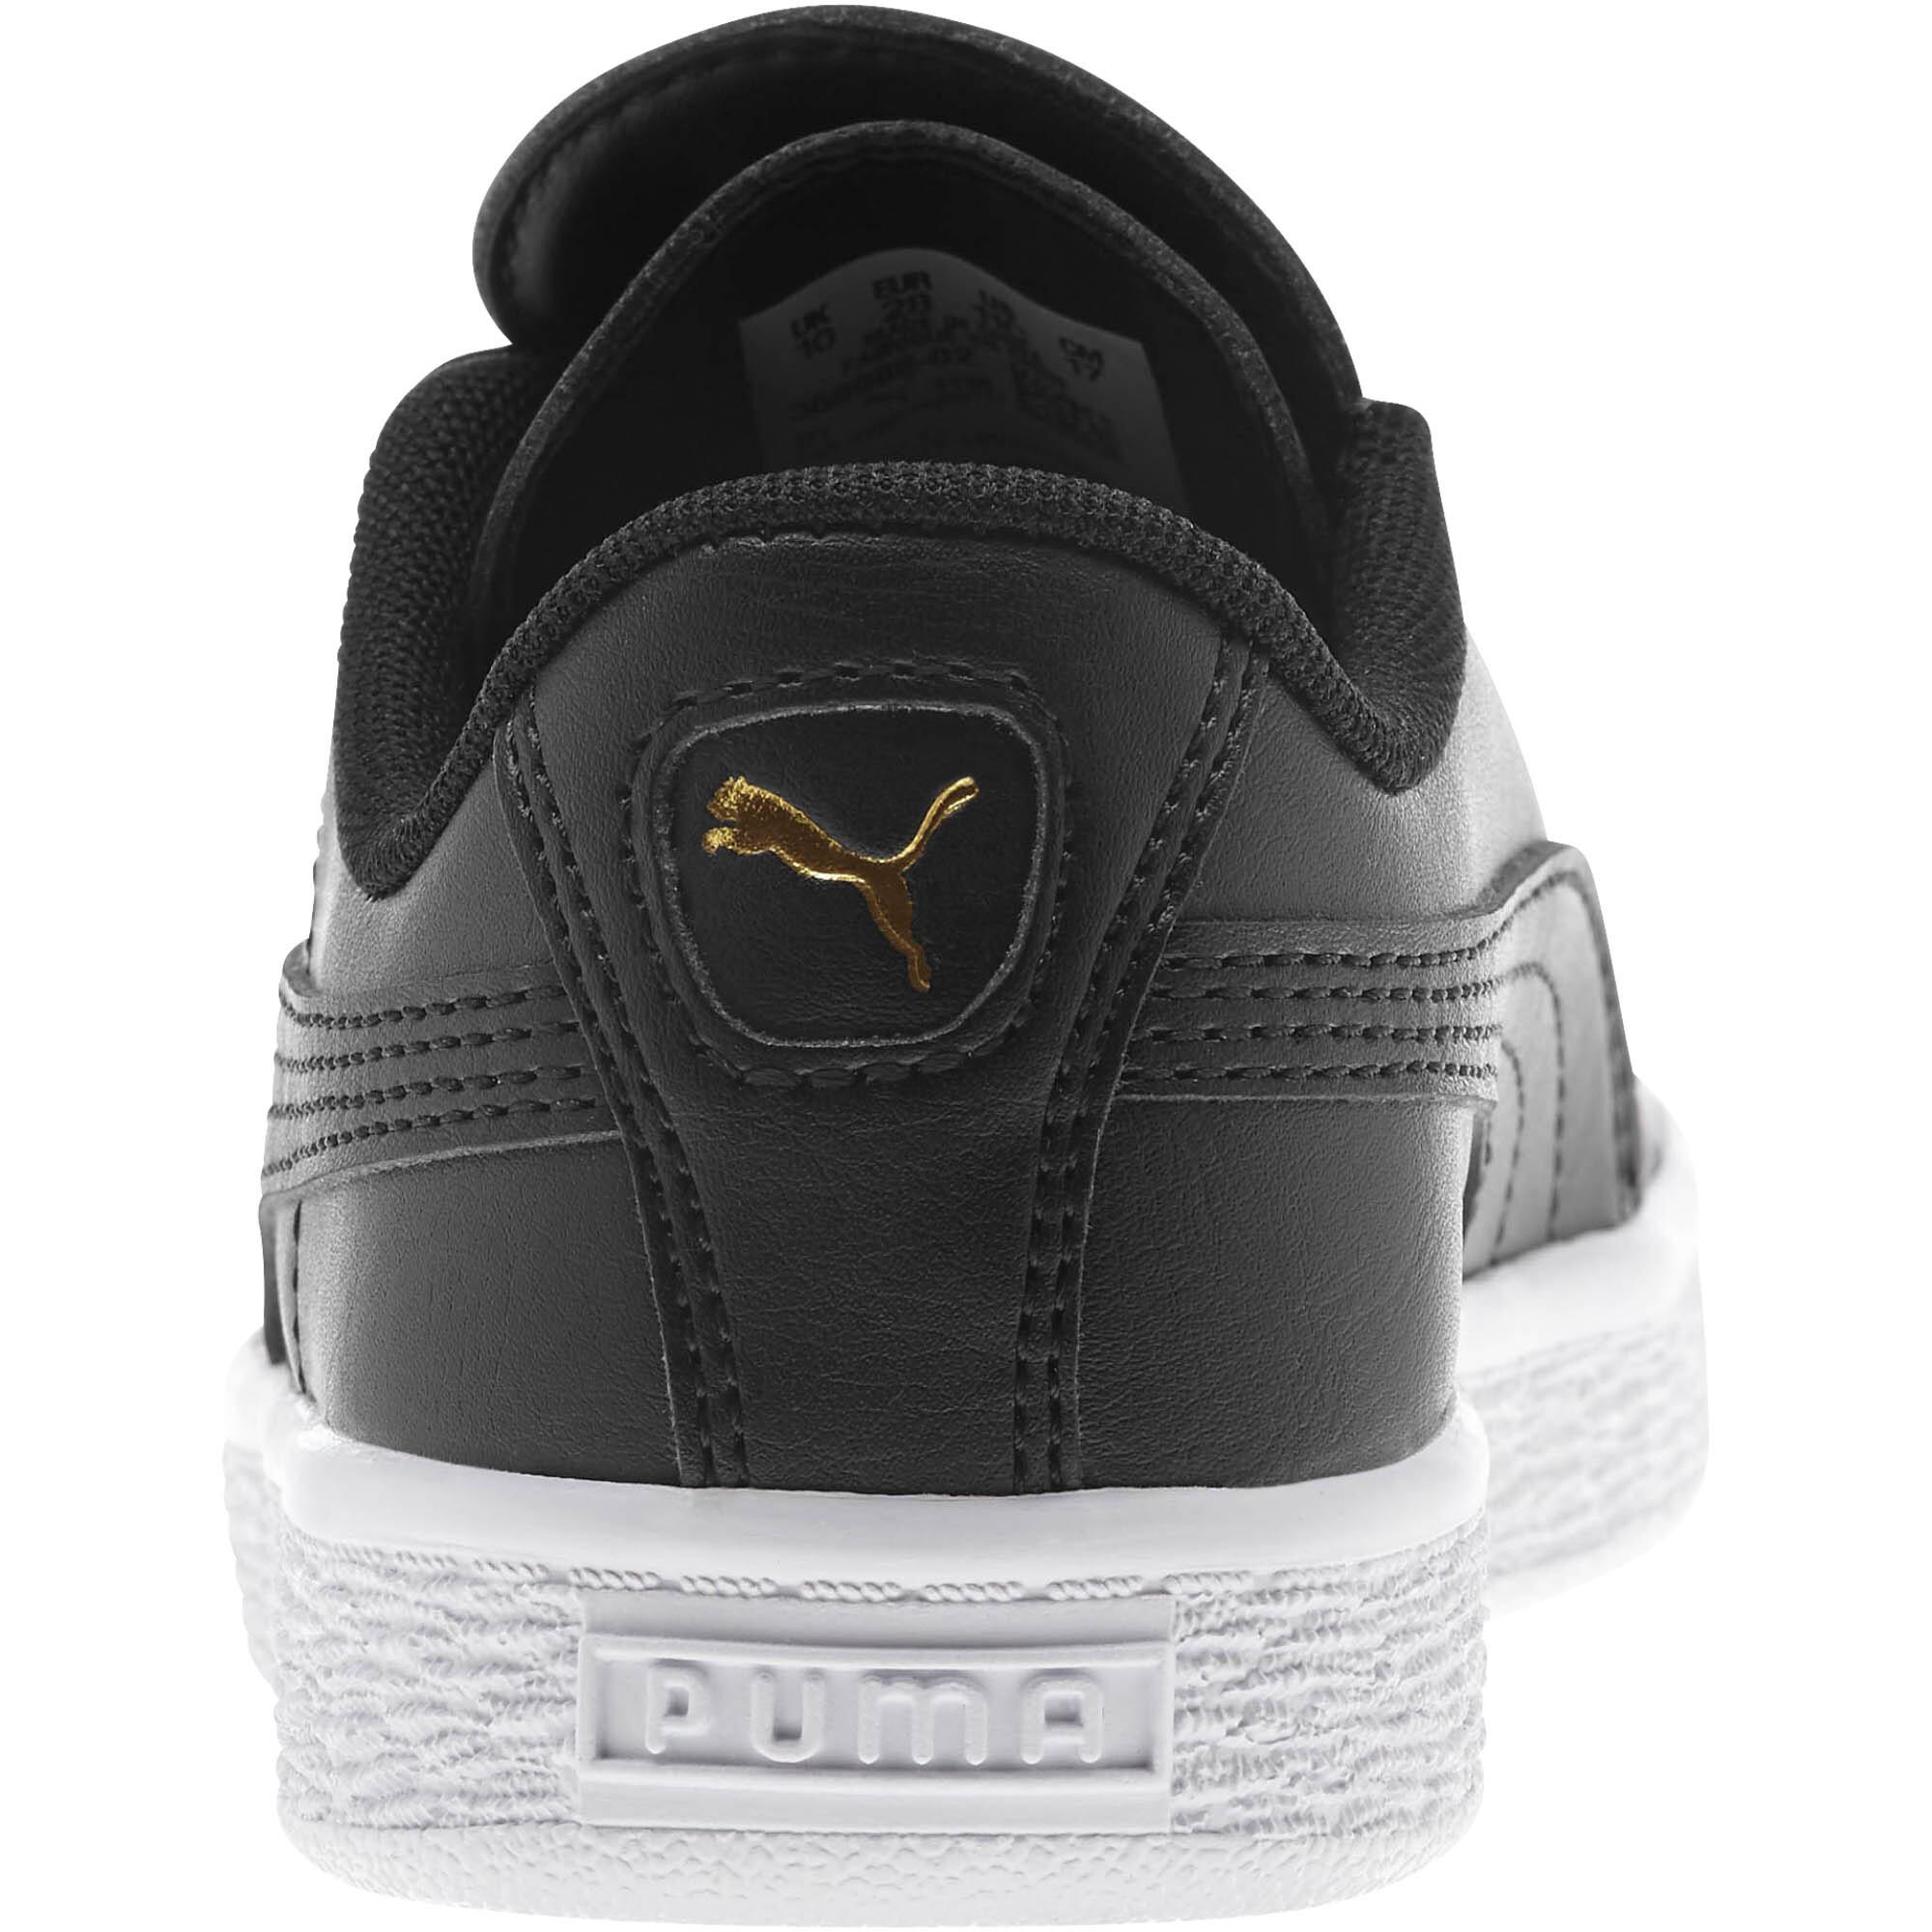 PUMA-Basket-Crush-AC-Little-Kids-039-Shoes-Girls-Shoe-Kids thumbnail 3